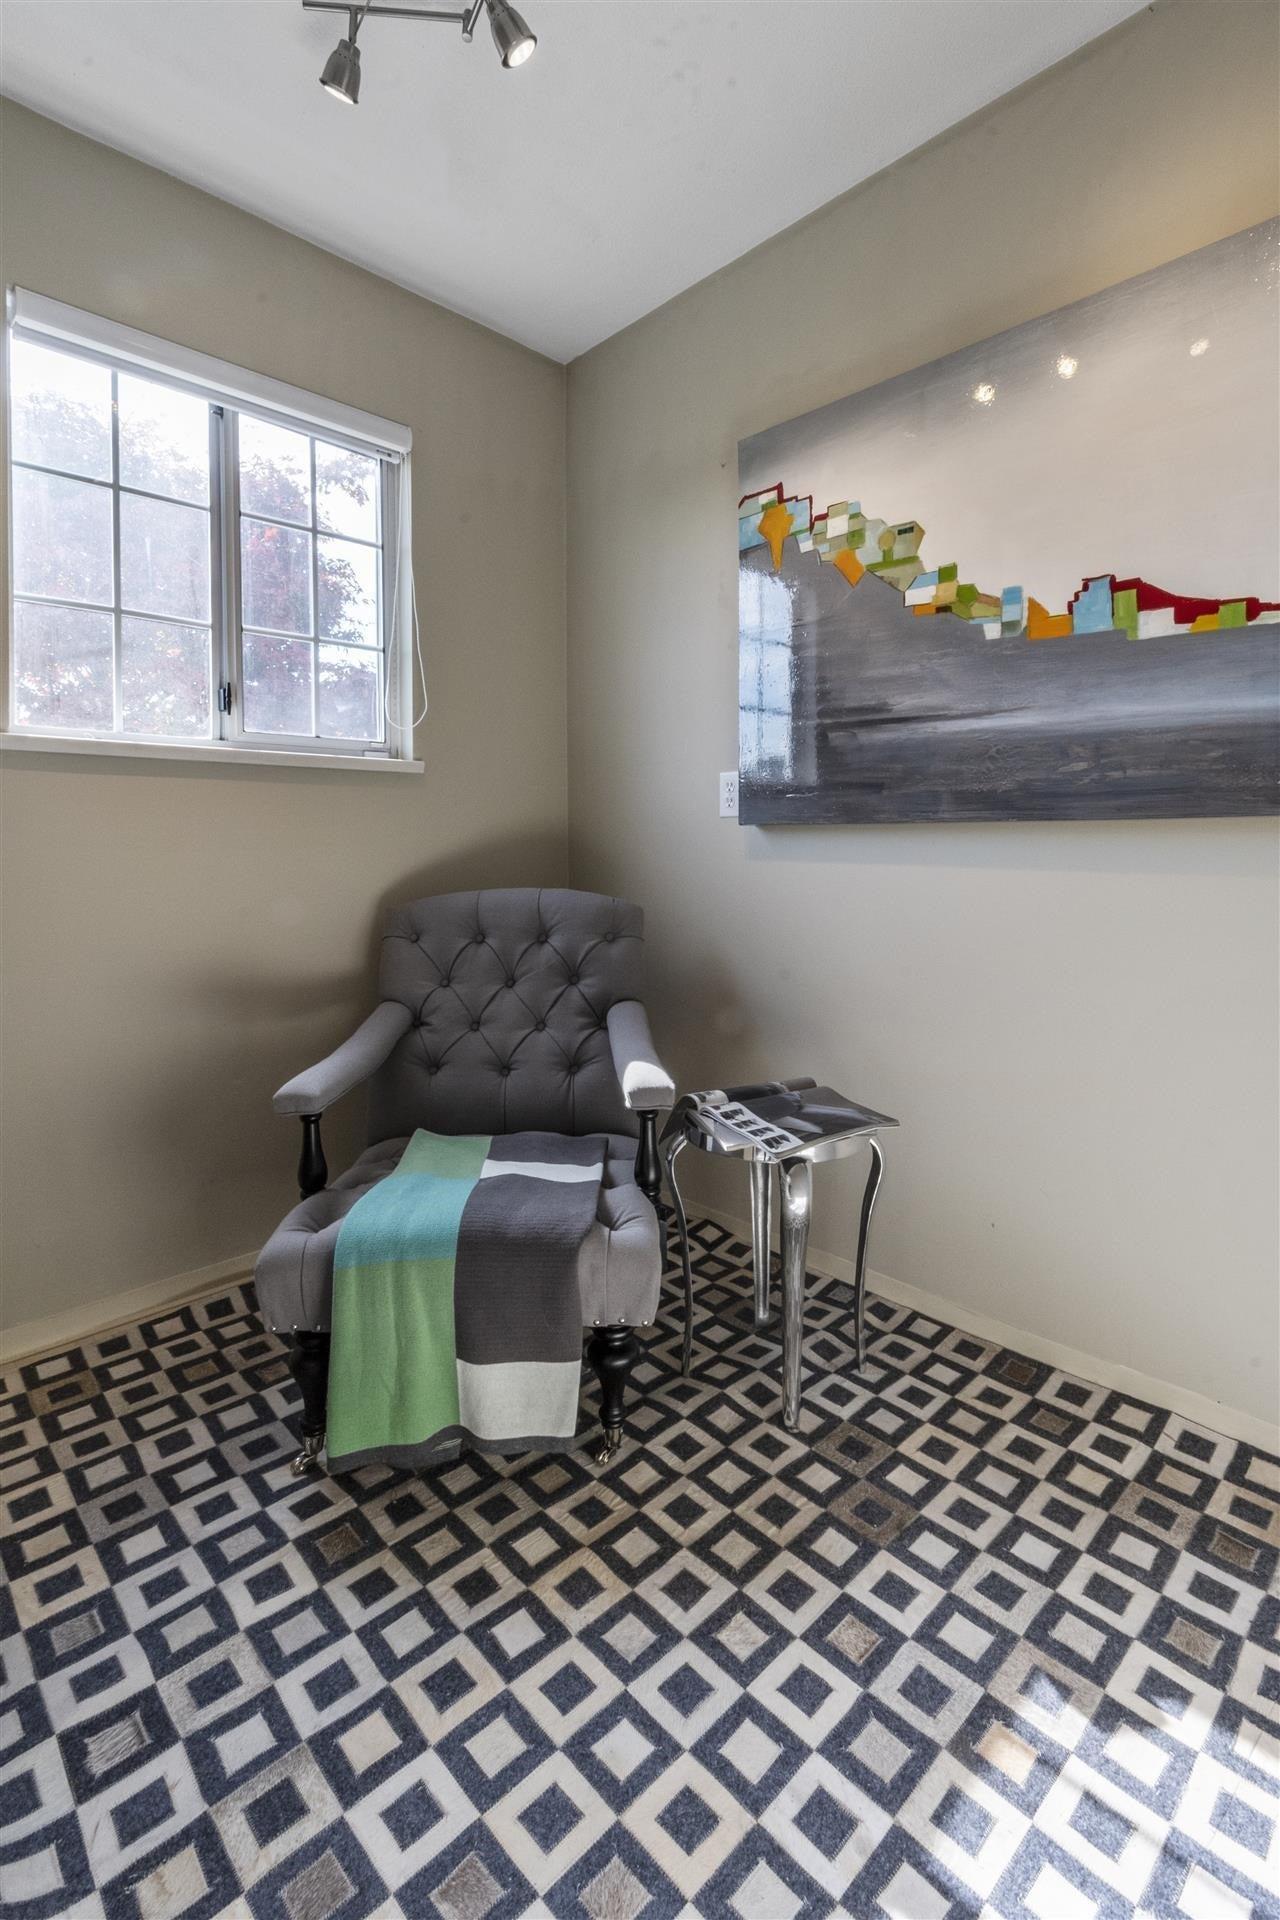 3631 GEORGIA STREET - Steveston Village House/Single Family for sale, 3 Bedrooms (R2623894) - #15